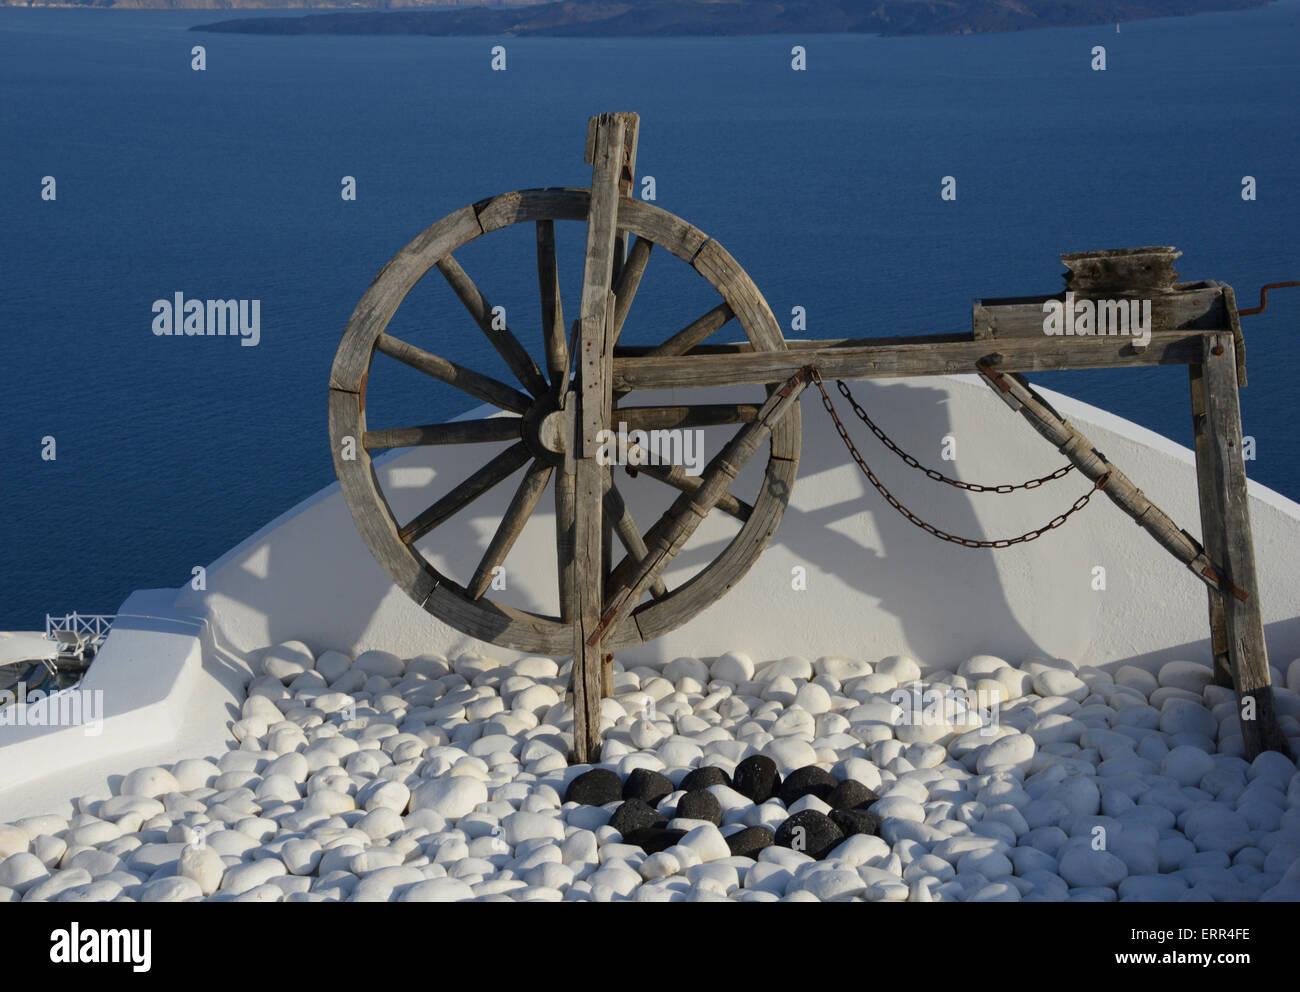 Wooden artefact displayed on rooftop, Oia, Santorini, Greece - Stock Image